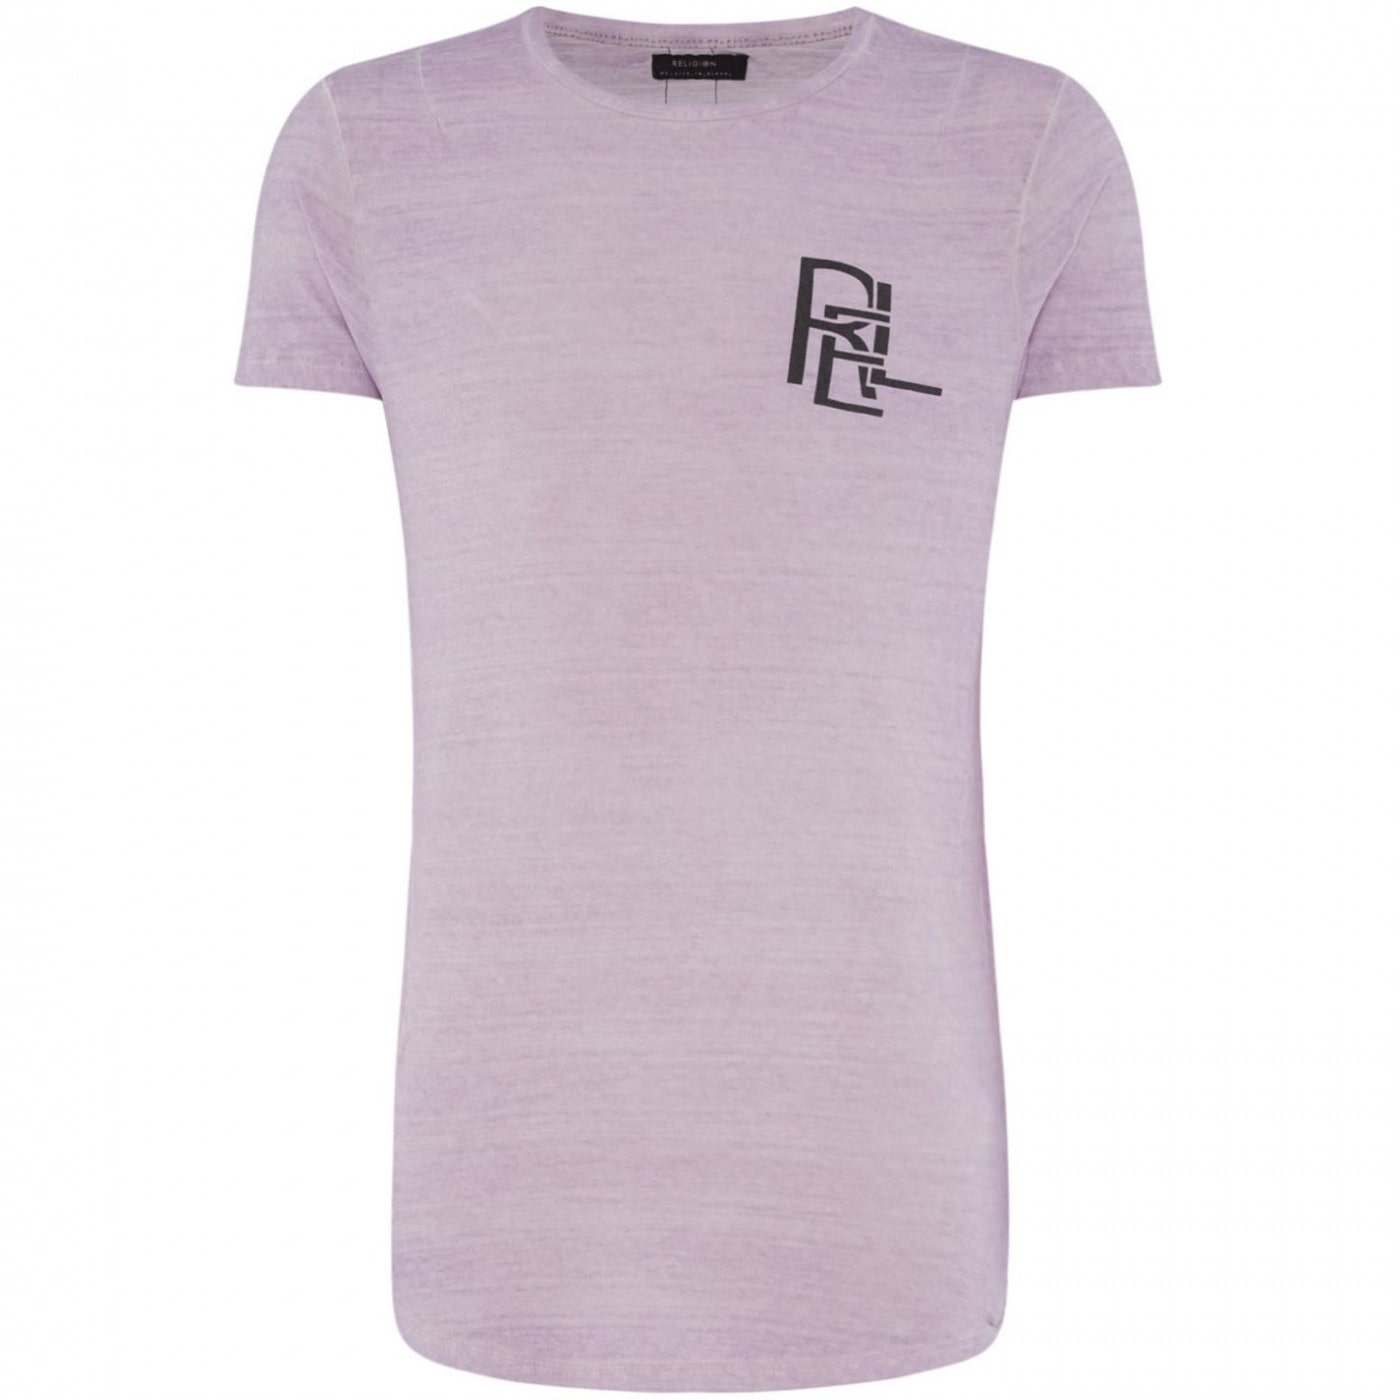 Religion Distressed Wash Text Logo T-Shirt